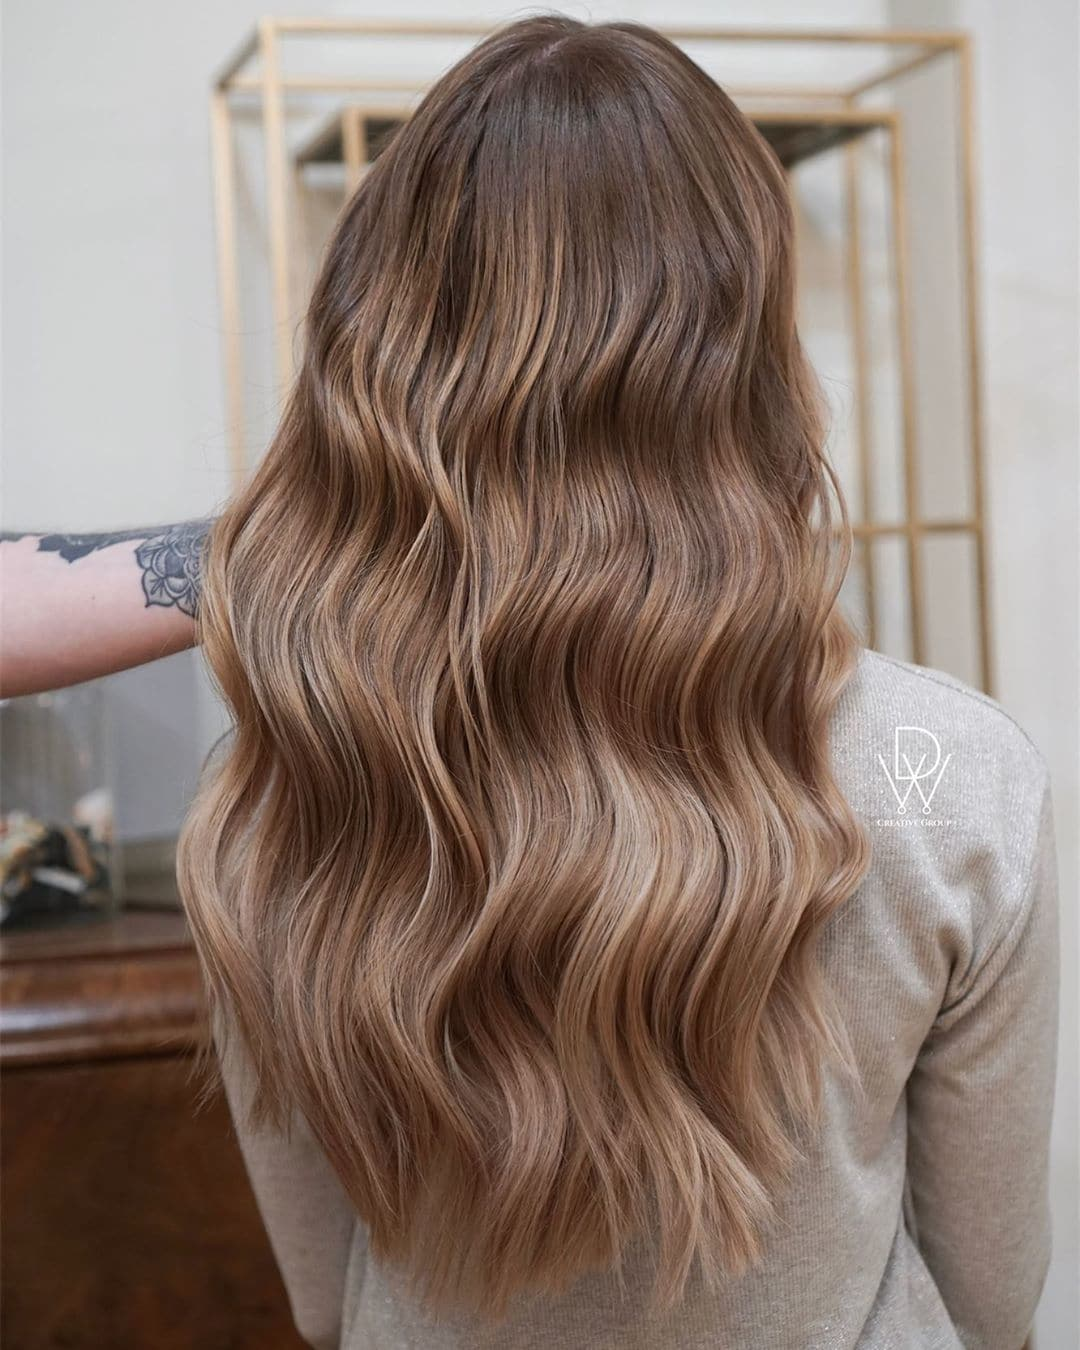 woman with long wavy dark blonde hair